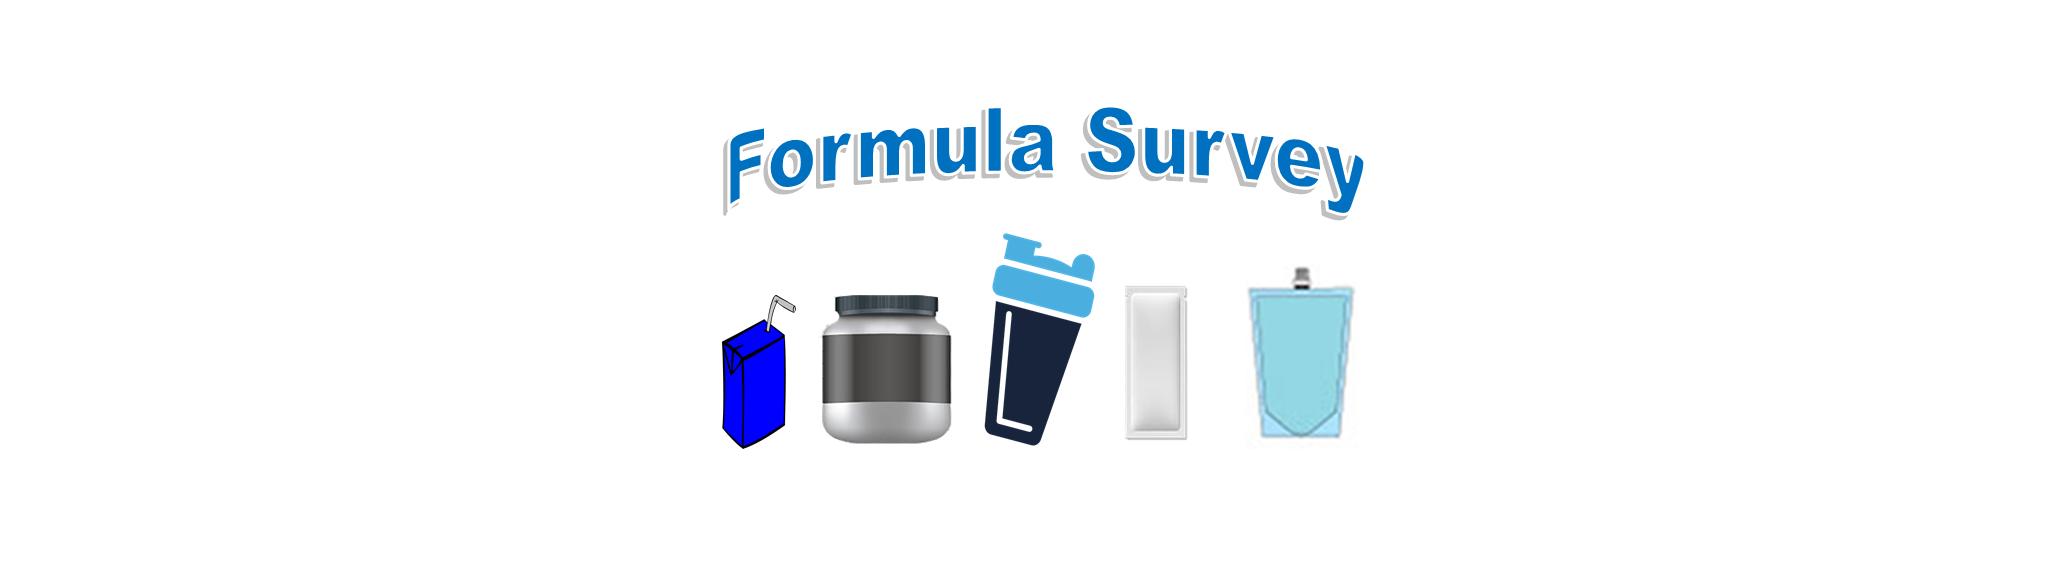 Formula Survey